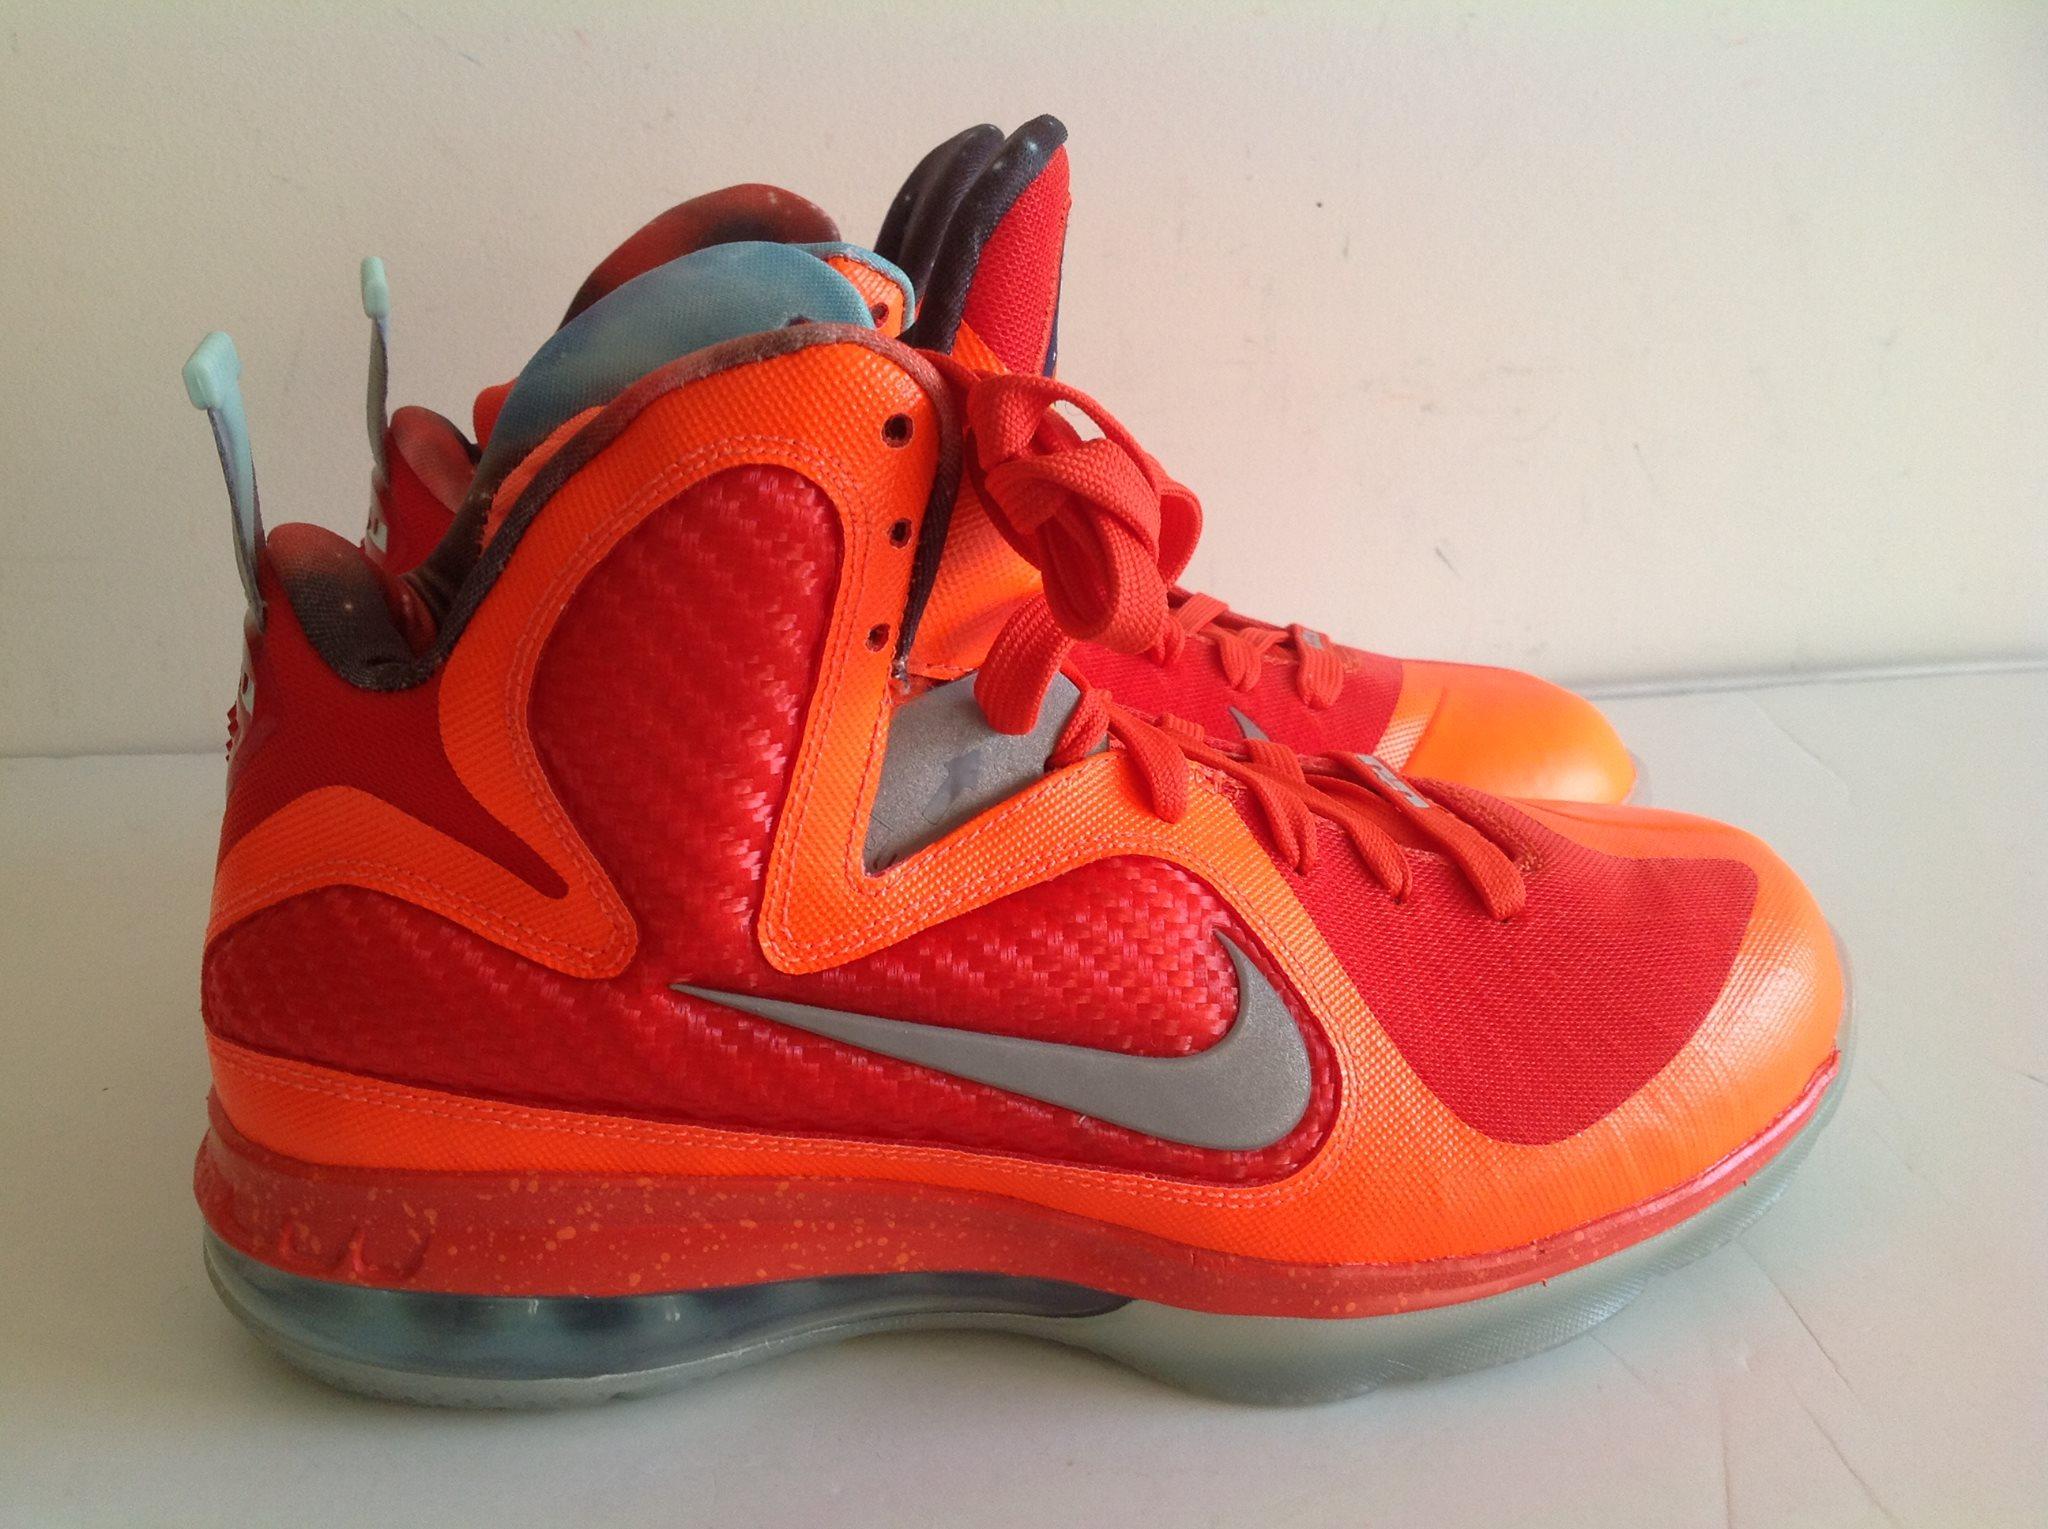 the best attitude 2f708 4e249 Nike Lebron 9 AS Big Bang All Star 520811 800